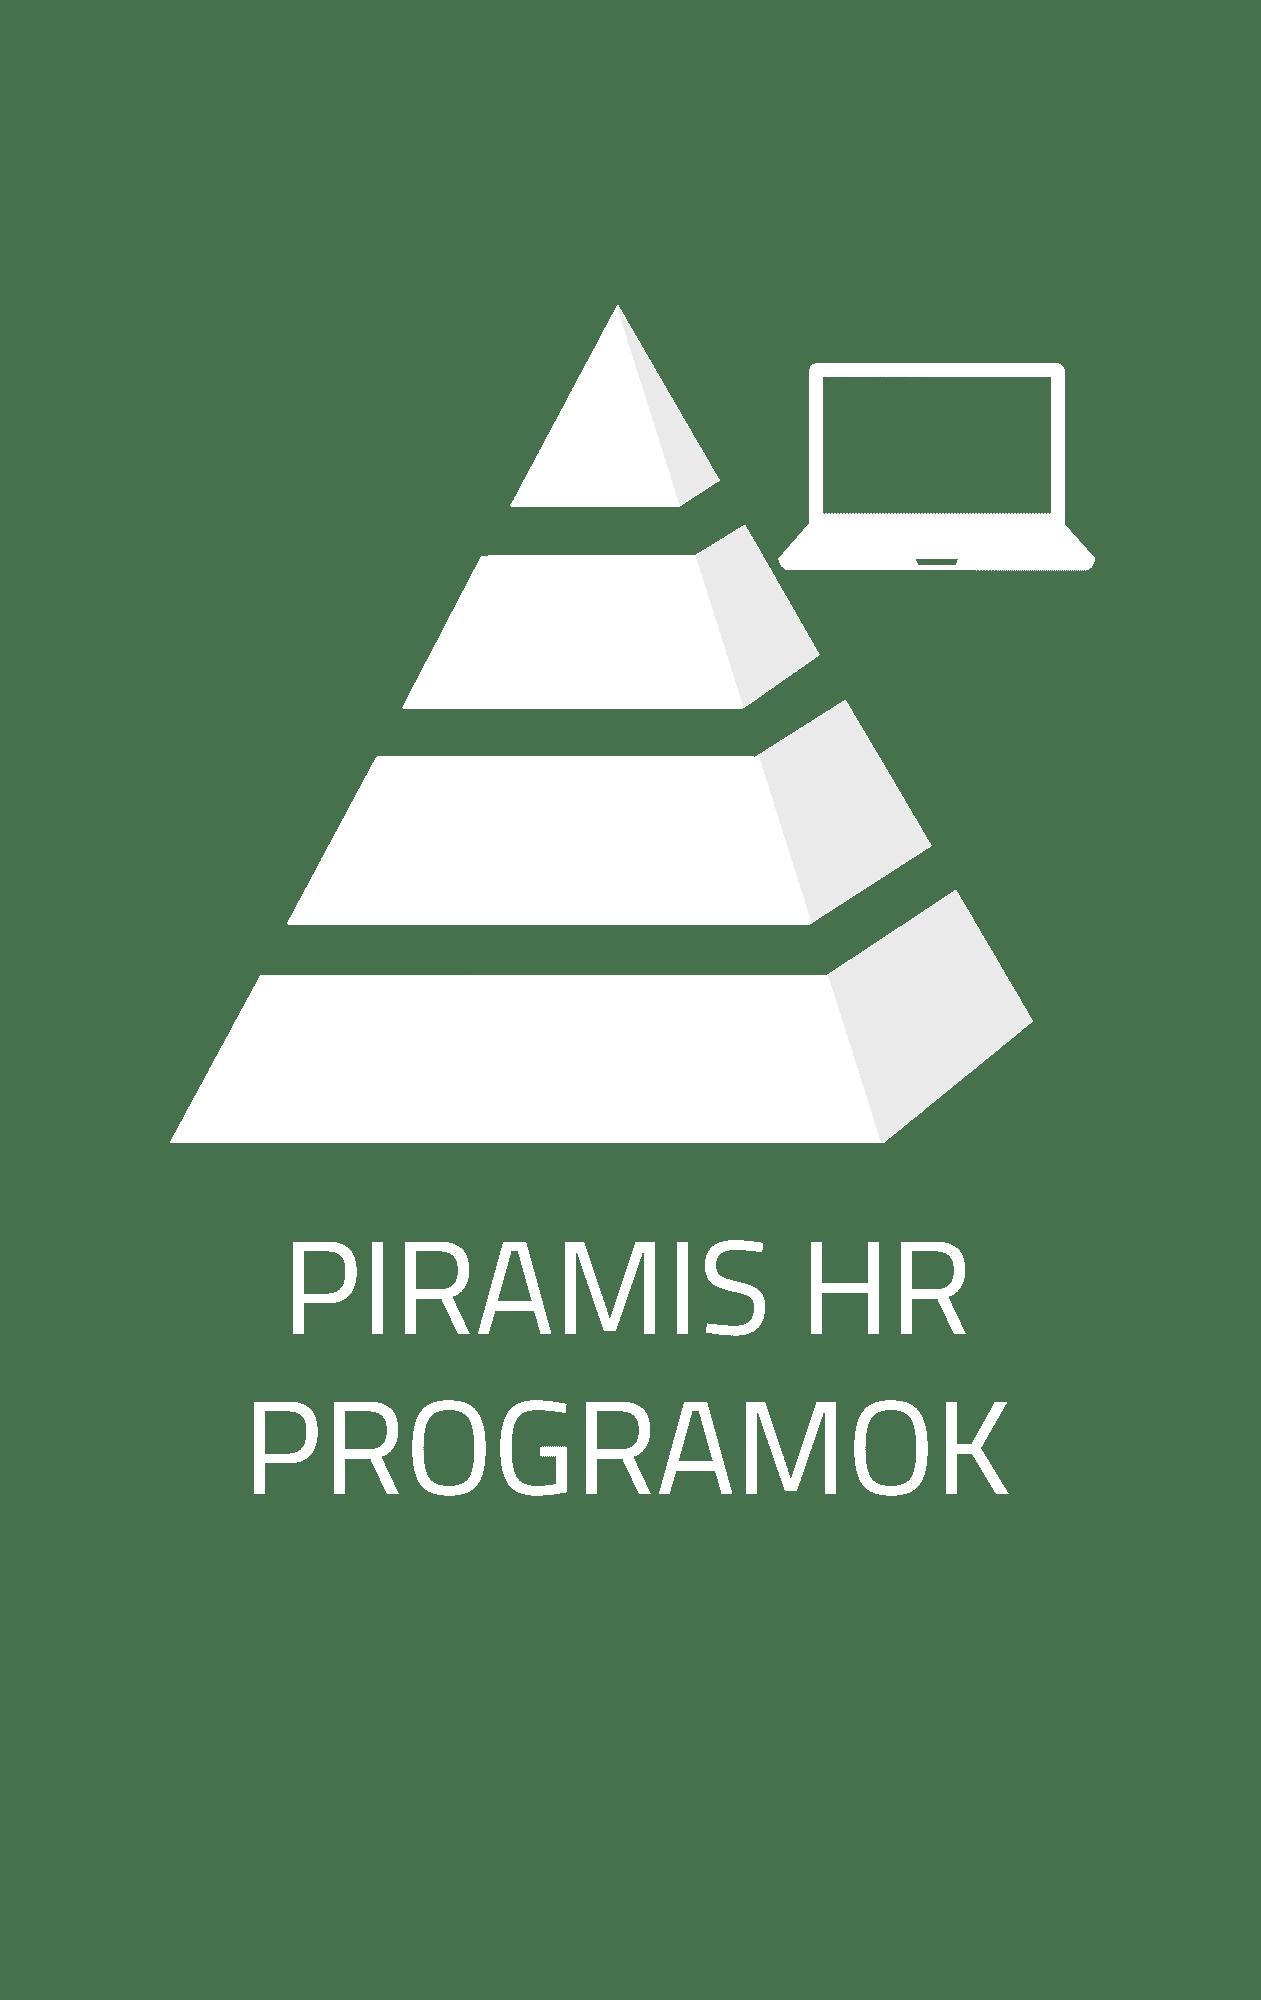 Piramis HR programok